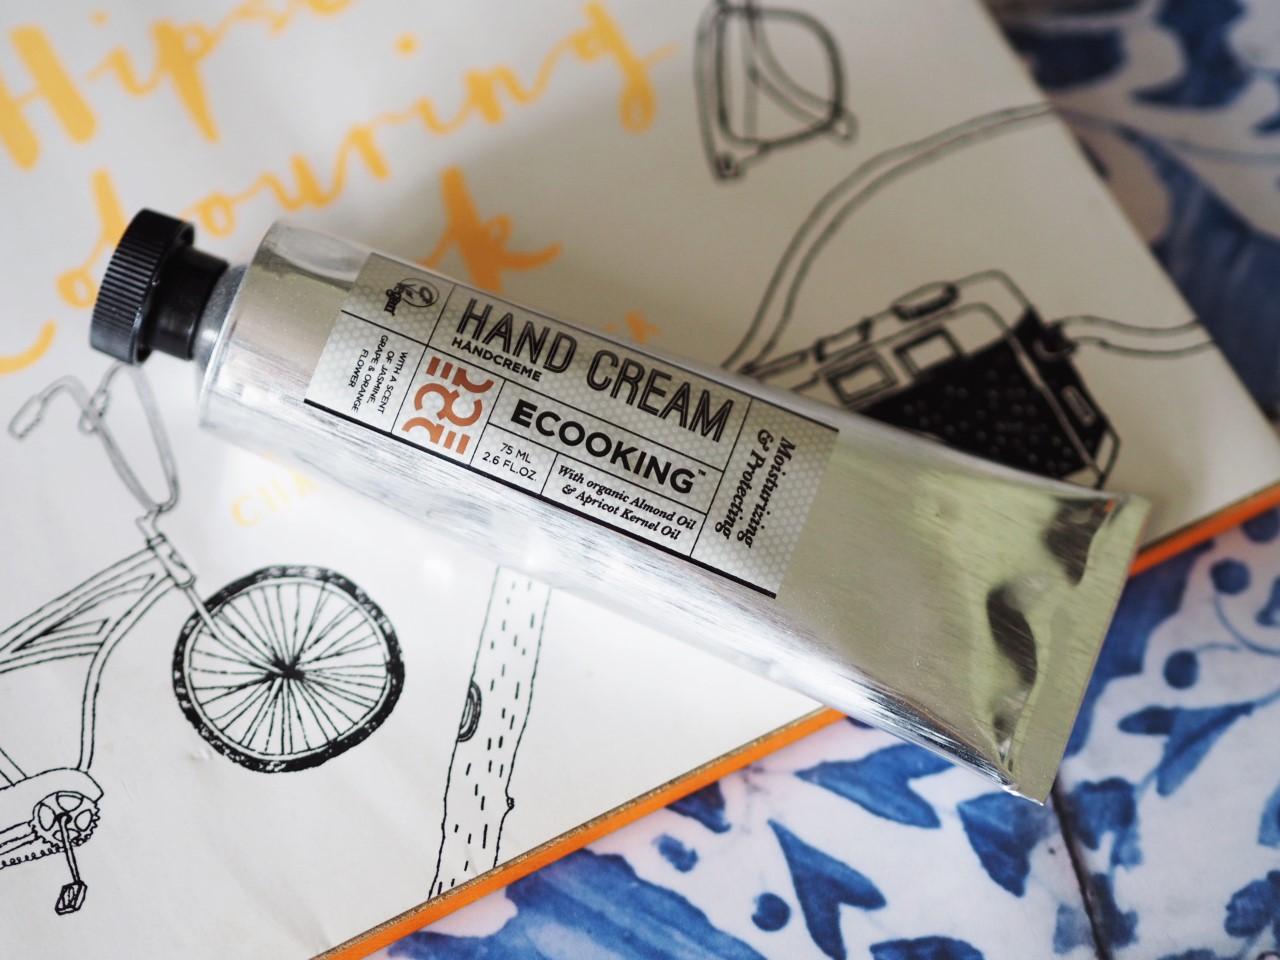 ECOOKING Hand Cream